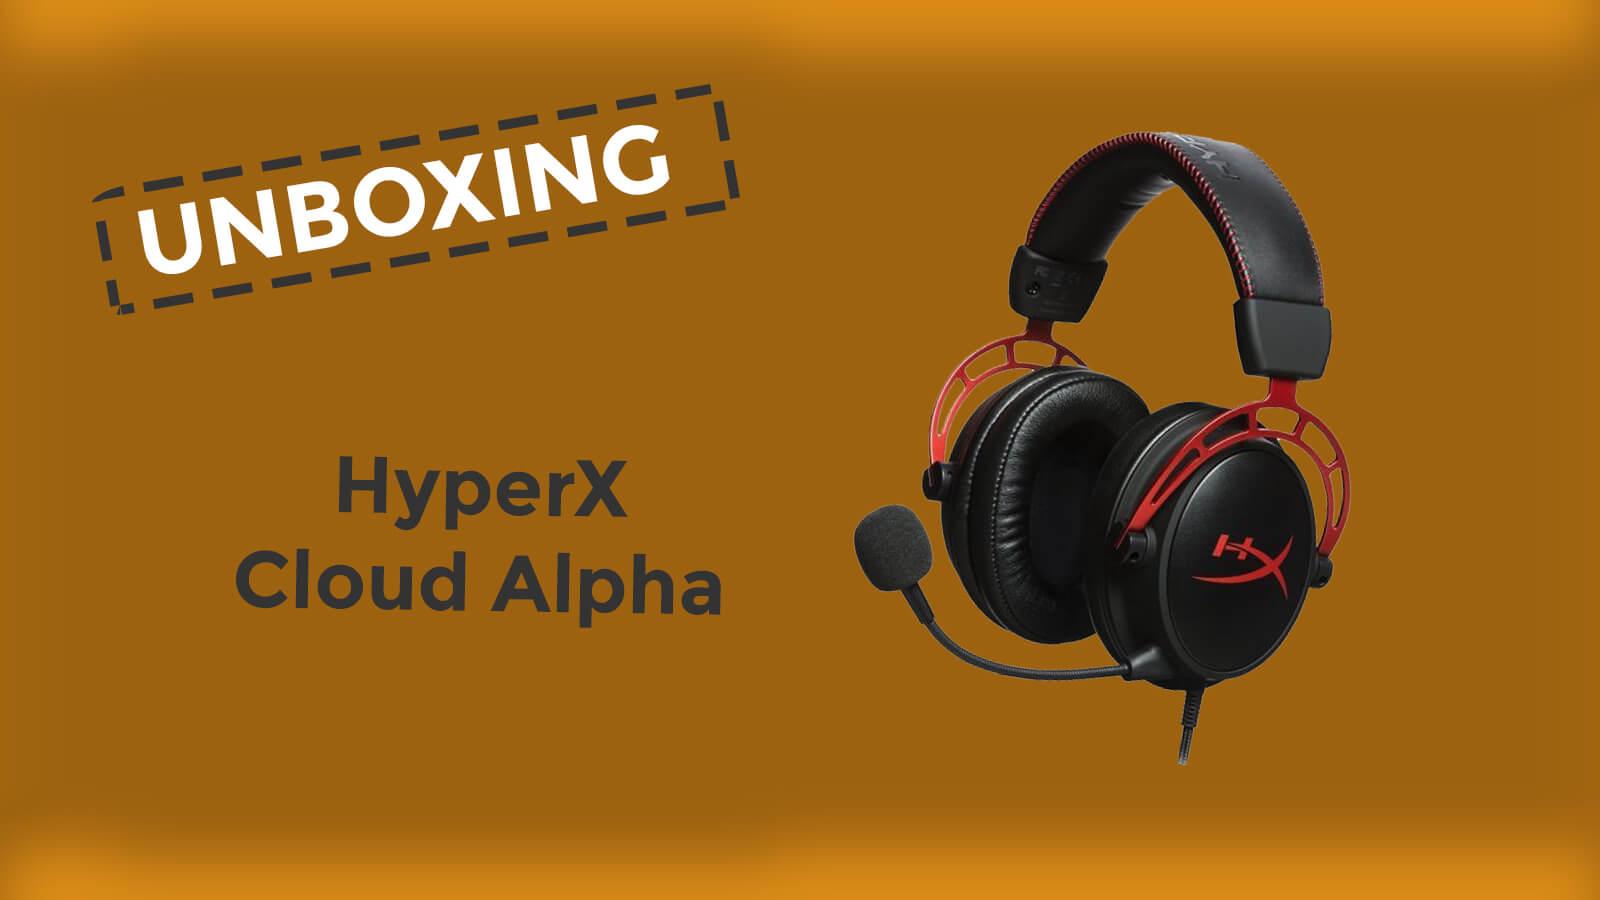 Unboxing HyperX Cloud Alpha